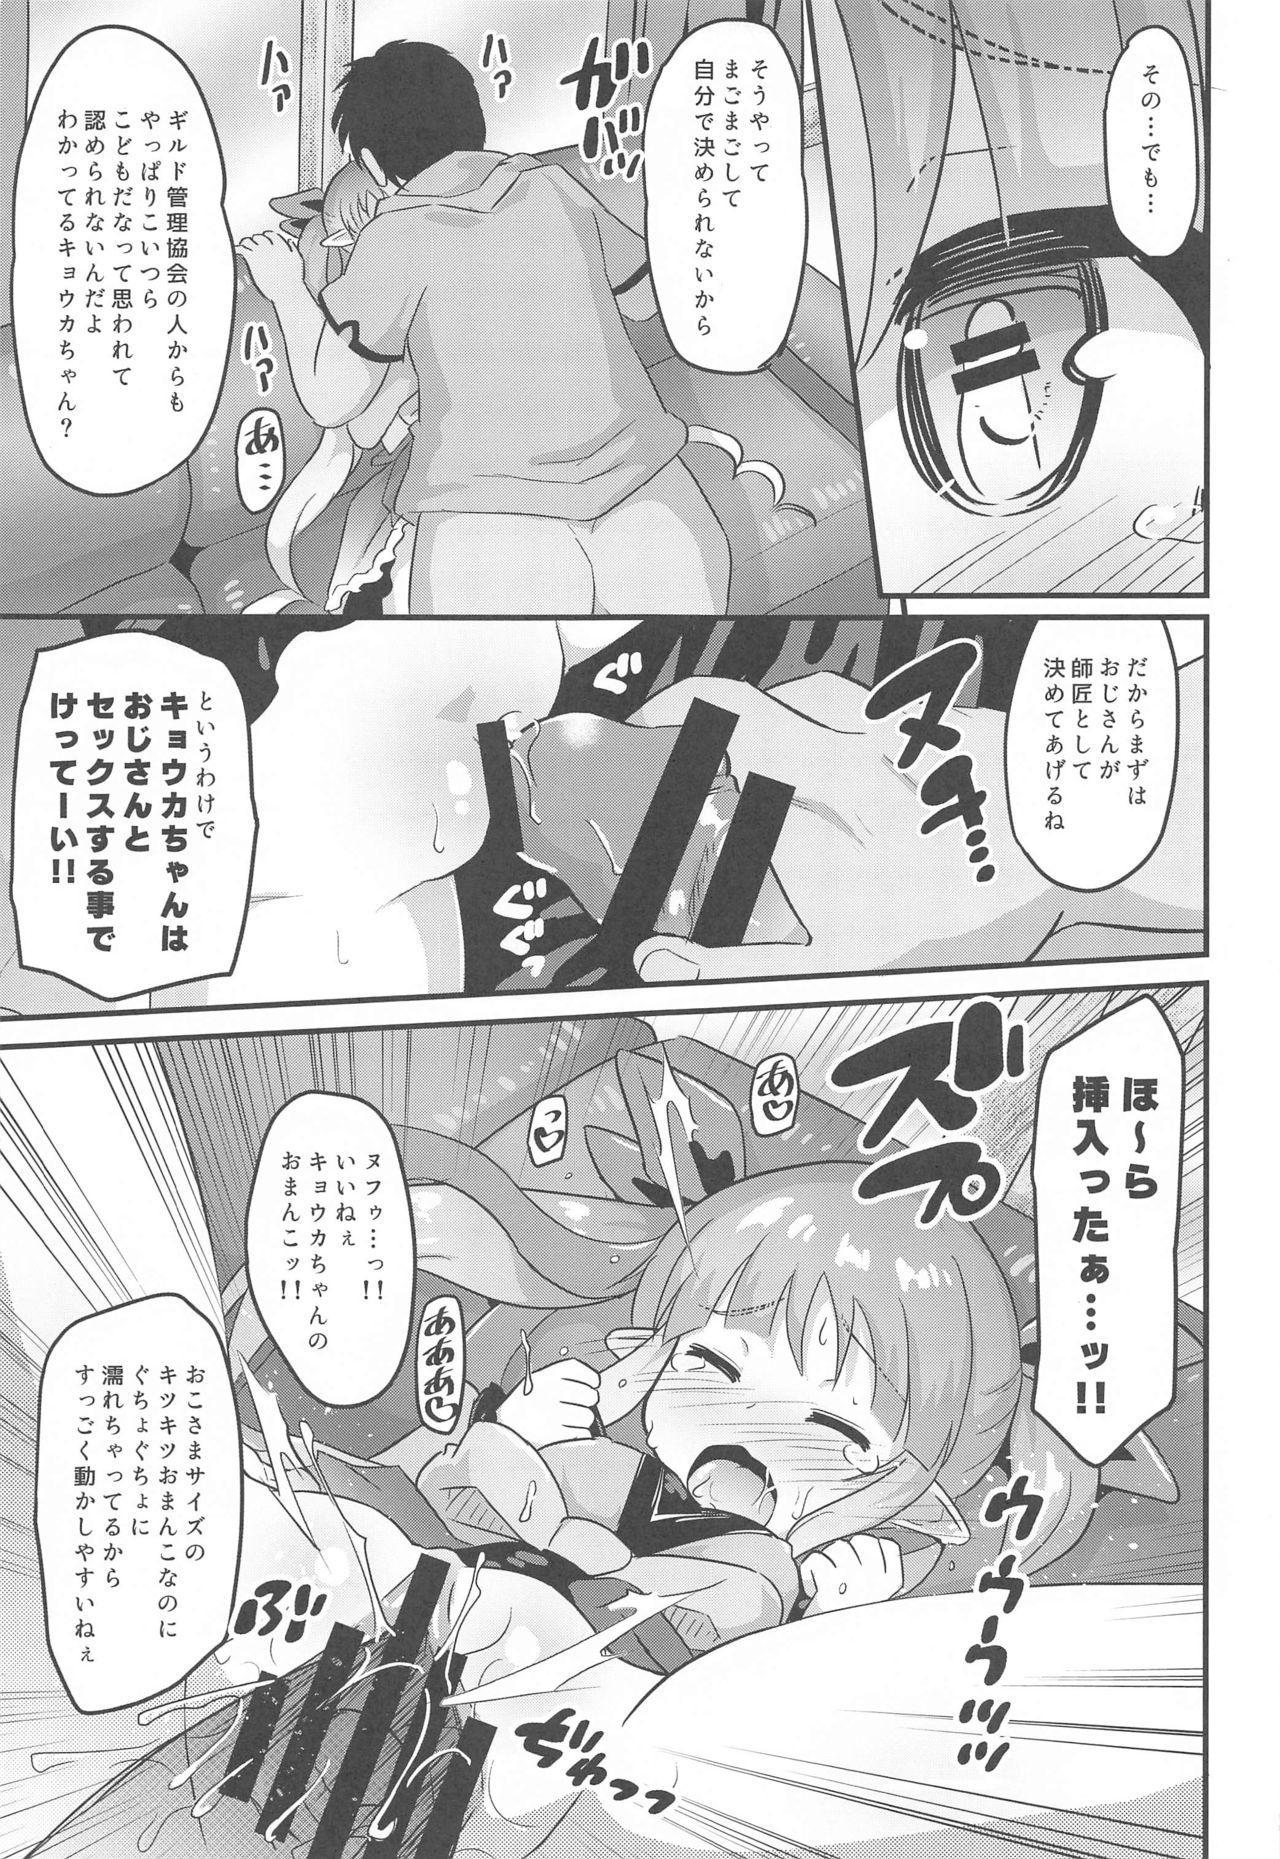 Kyouka-chan to Otona no Guild Katsudou 11